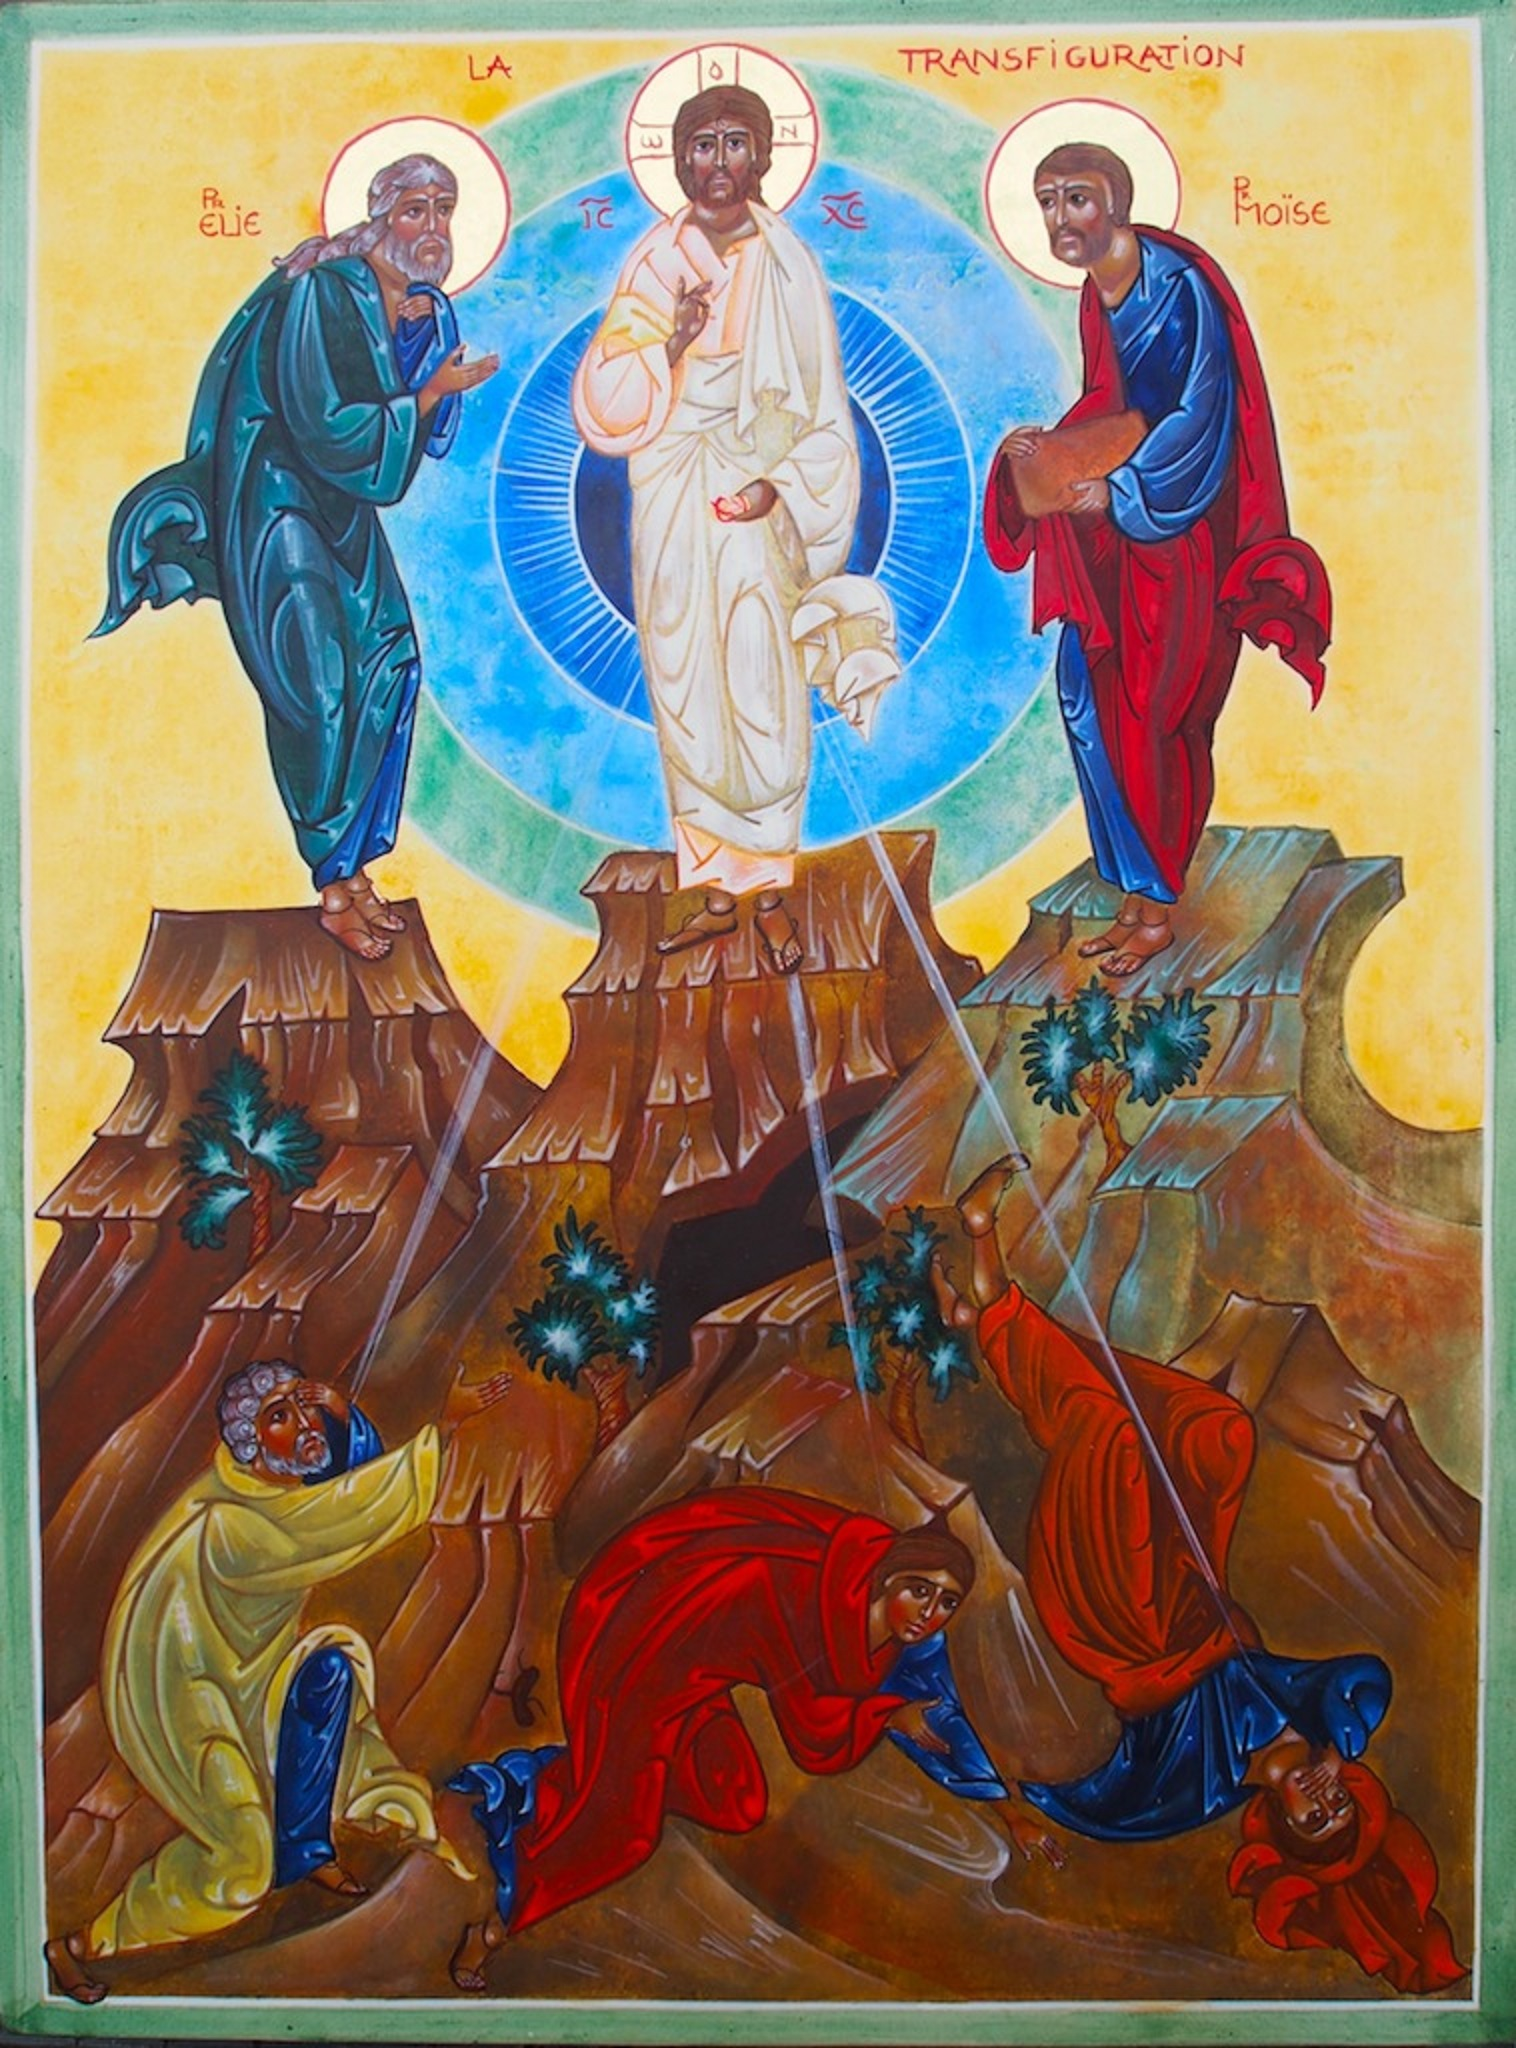 Transfiguration de Jésus 2017 3.jpg